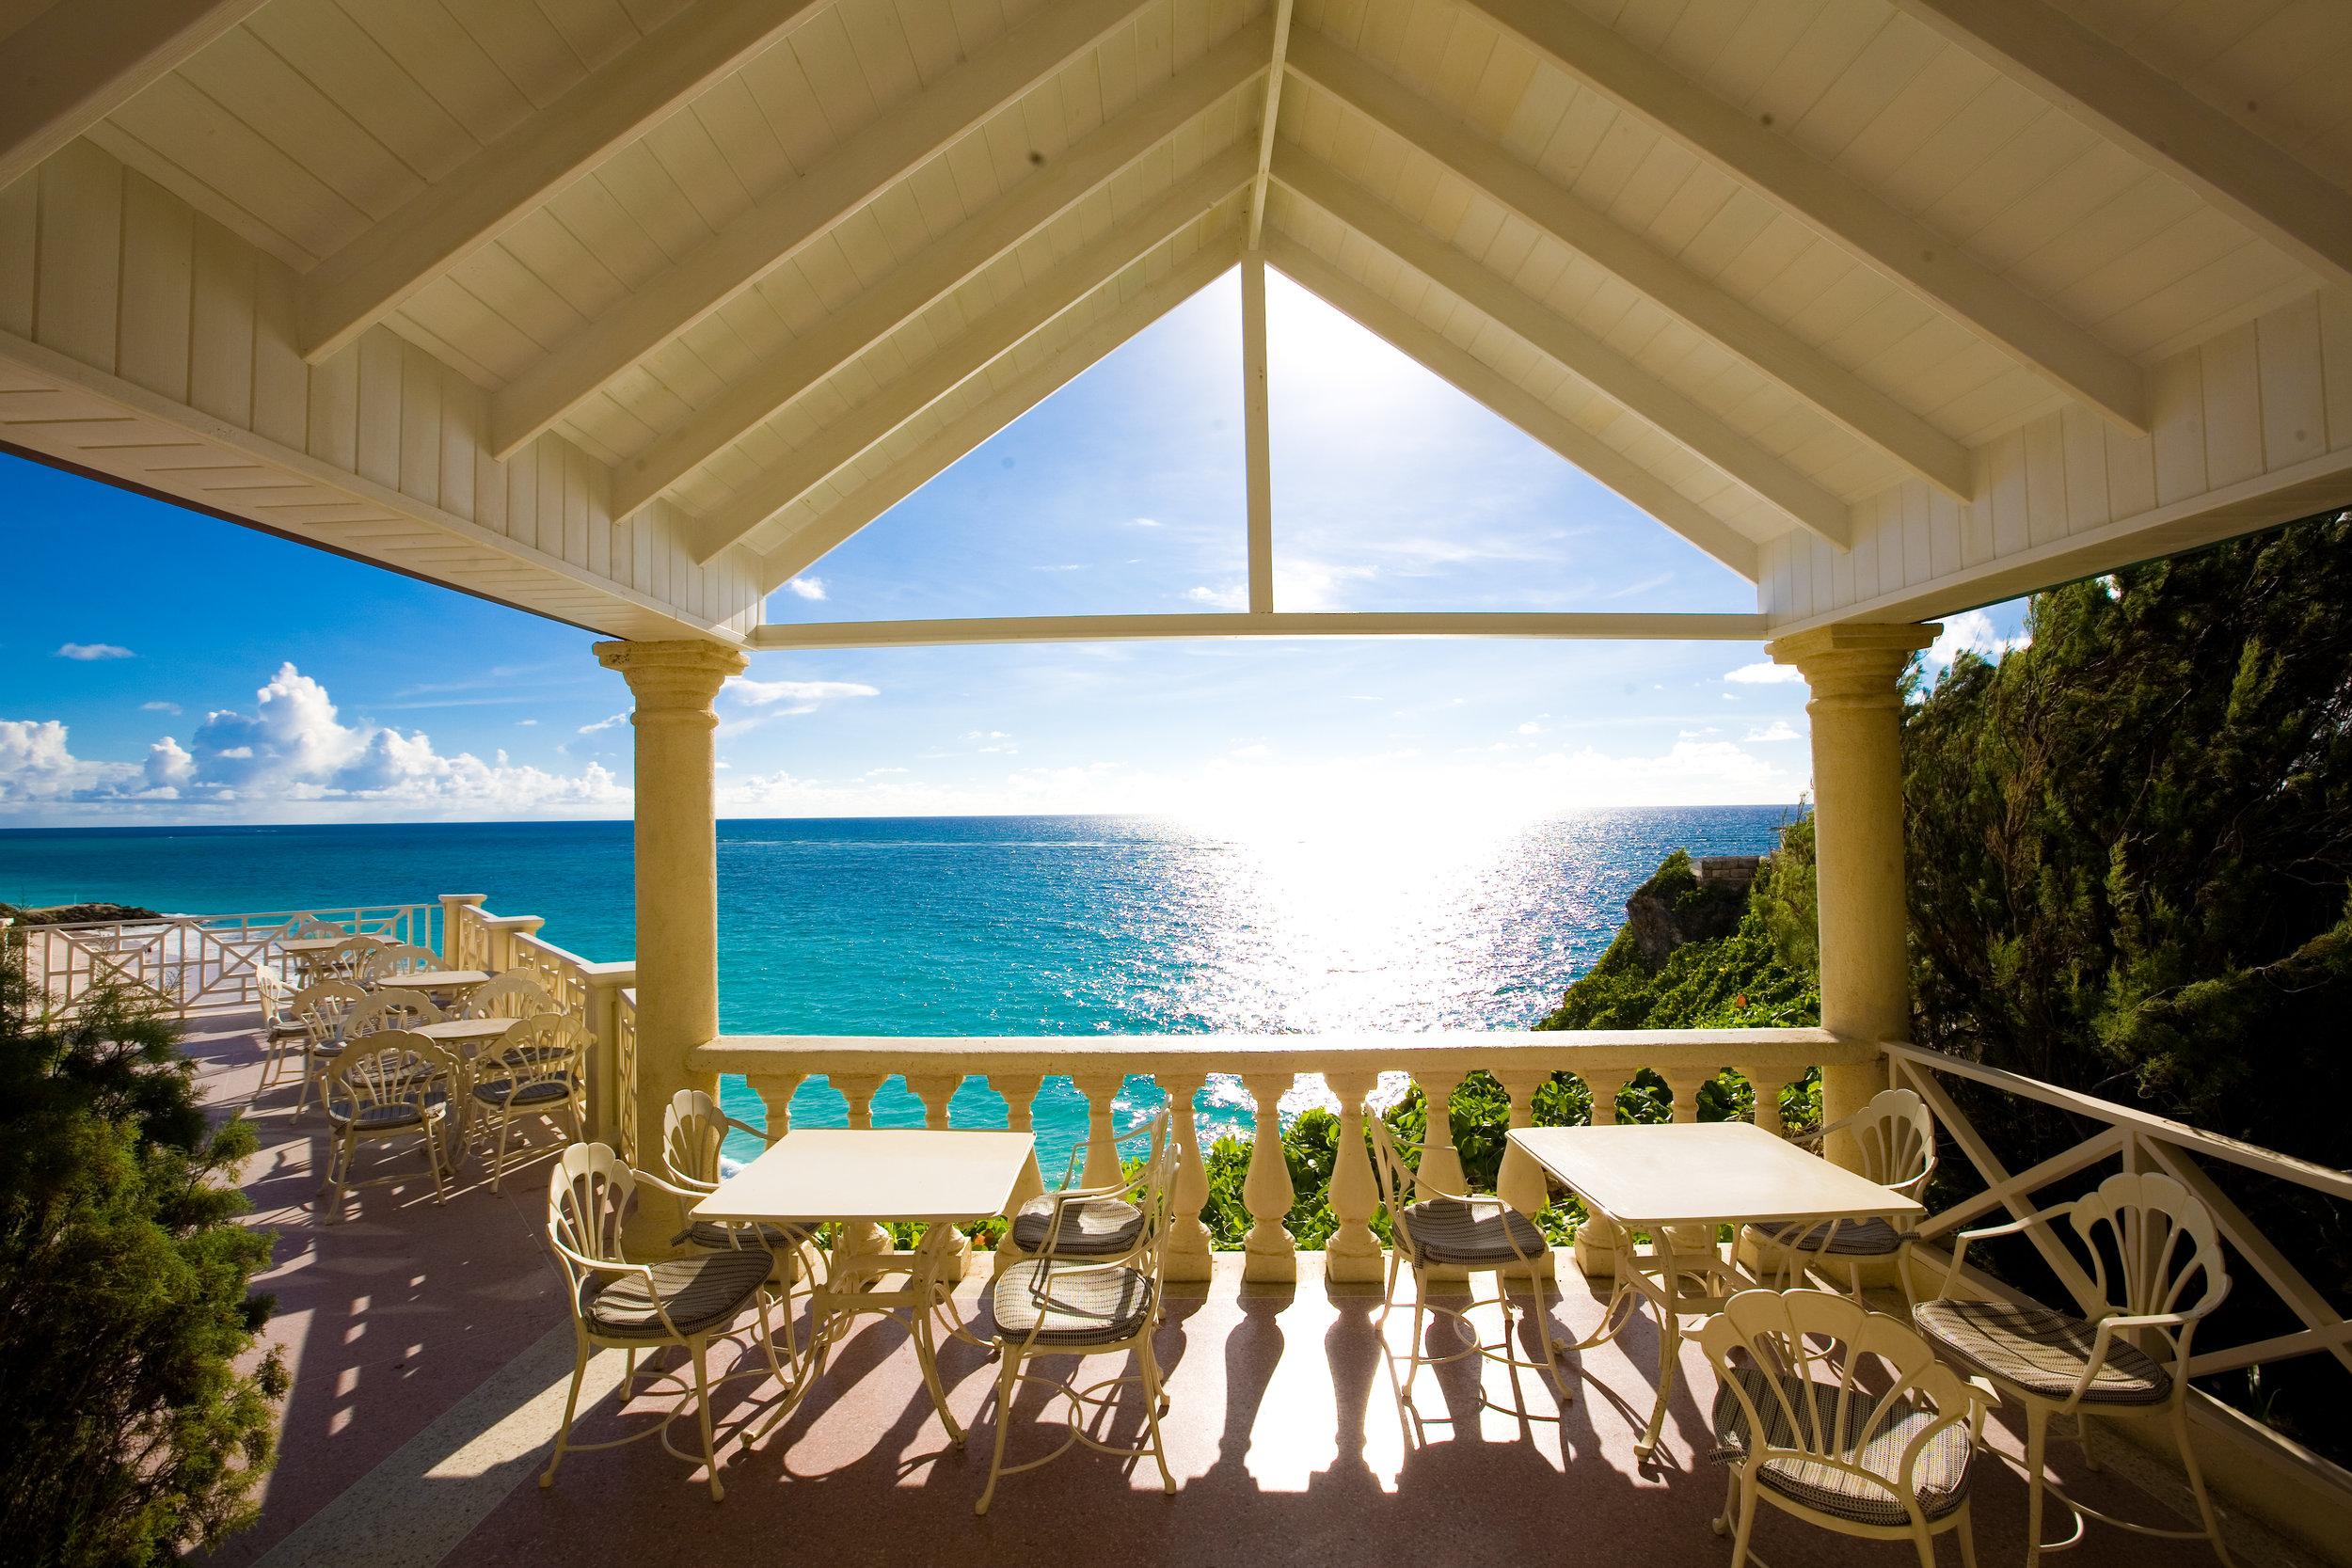 The Crane - View of Crane Beach from Pavilion Room.jpg